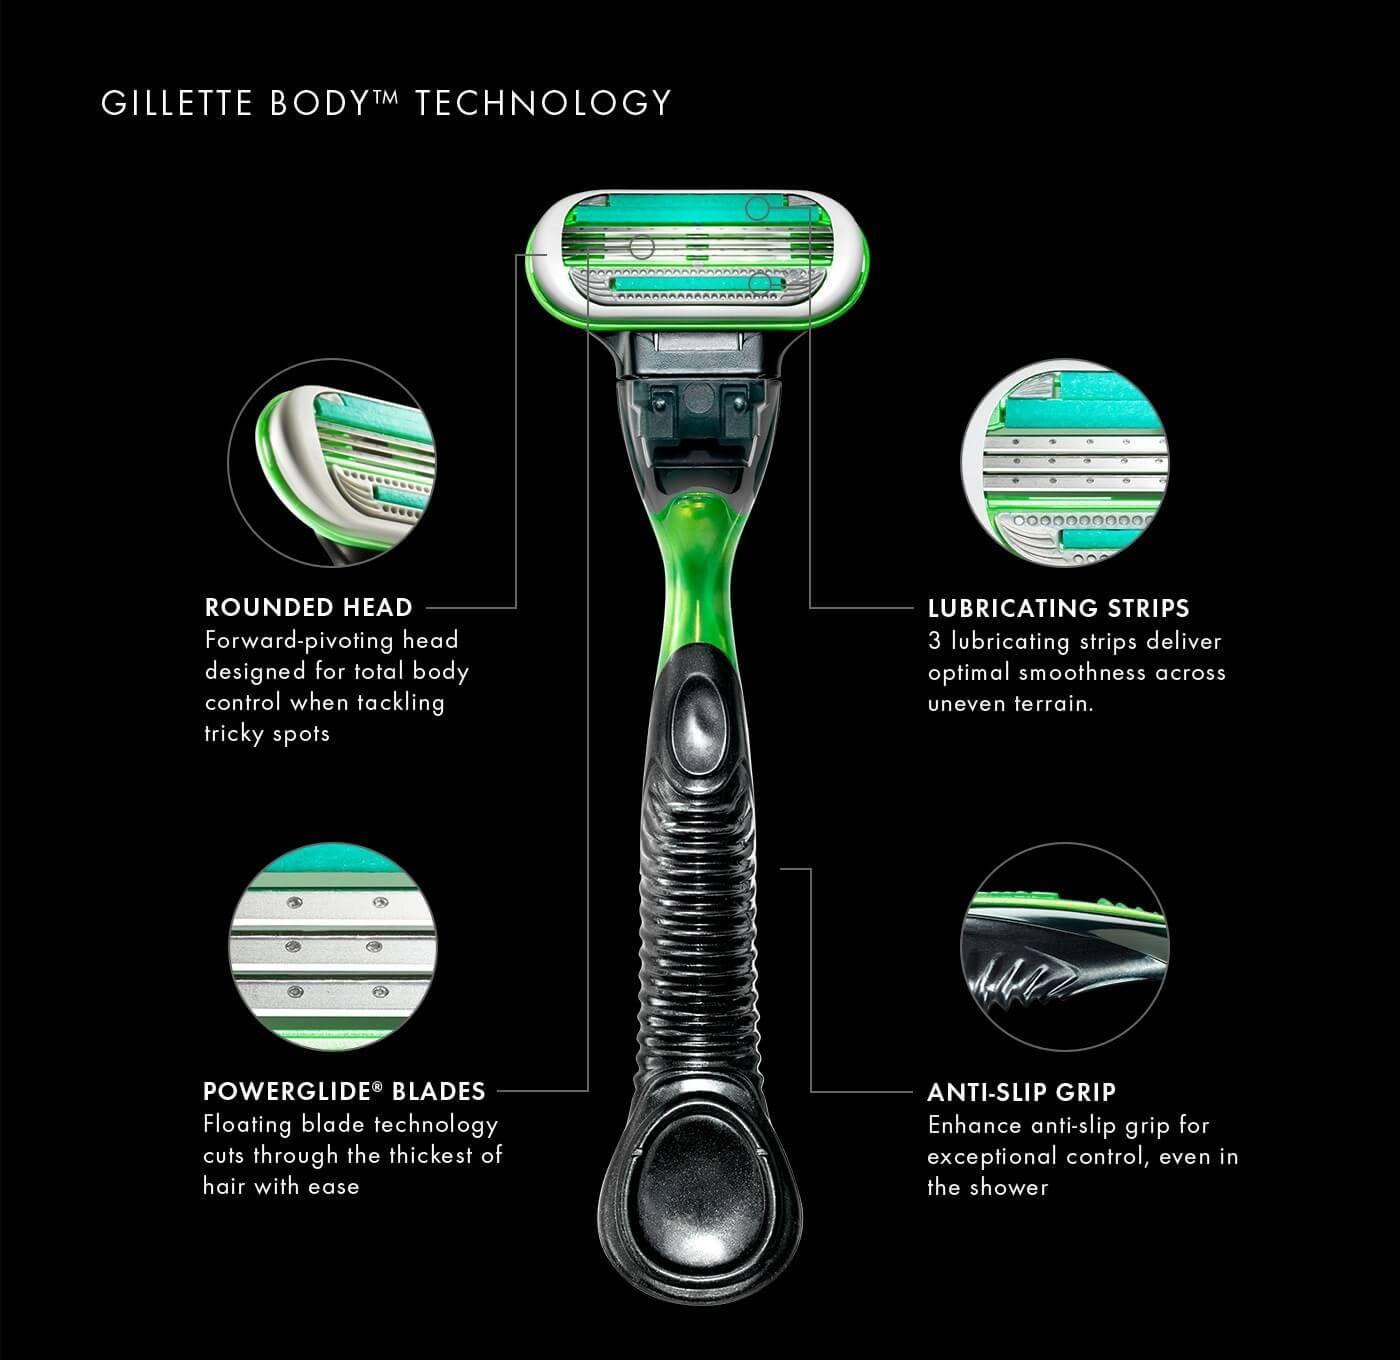 gillette technology